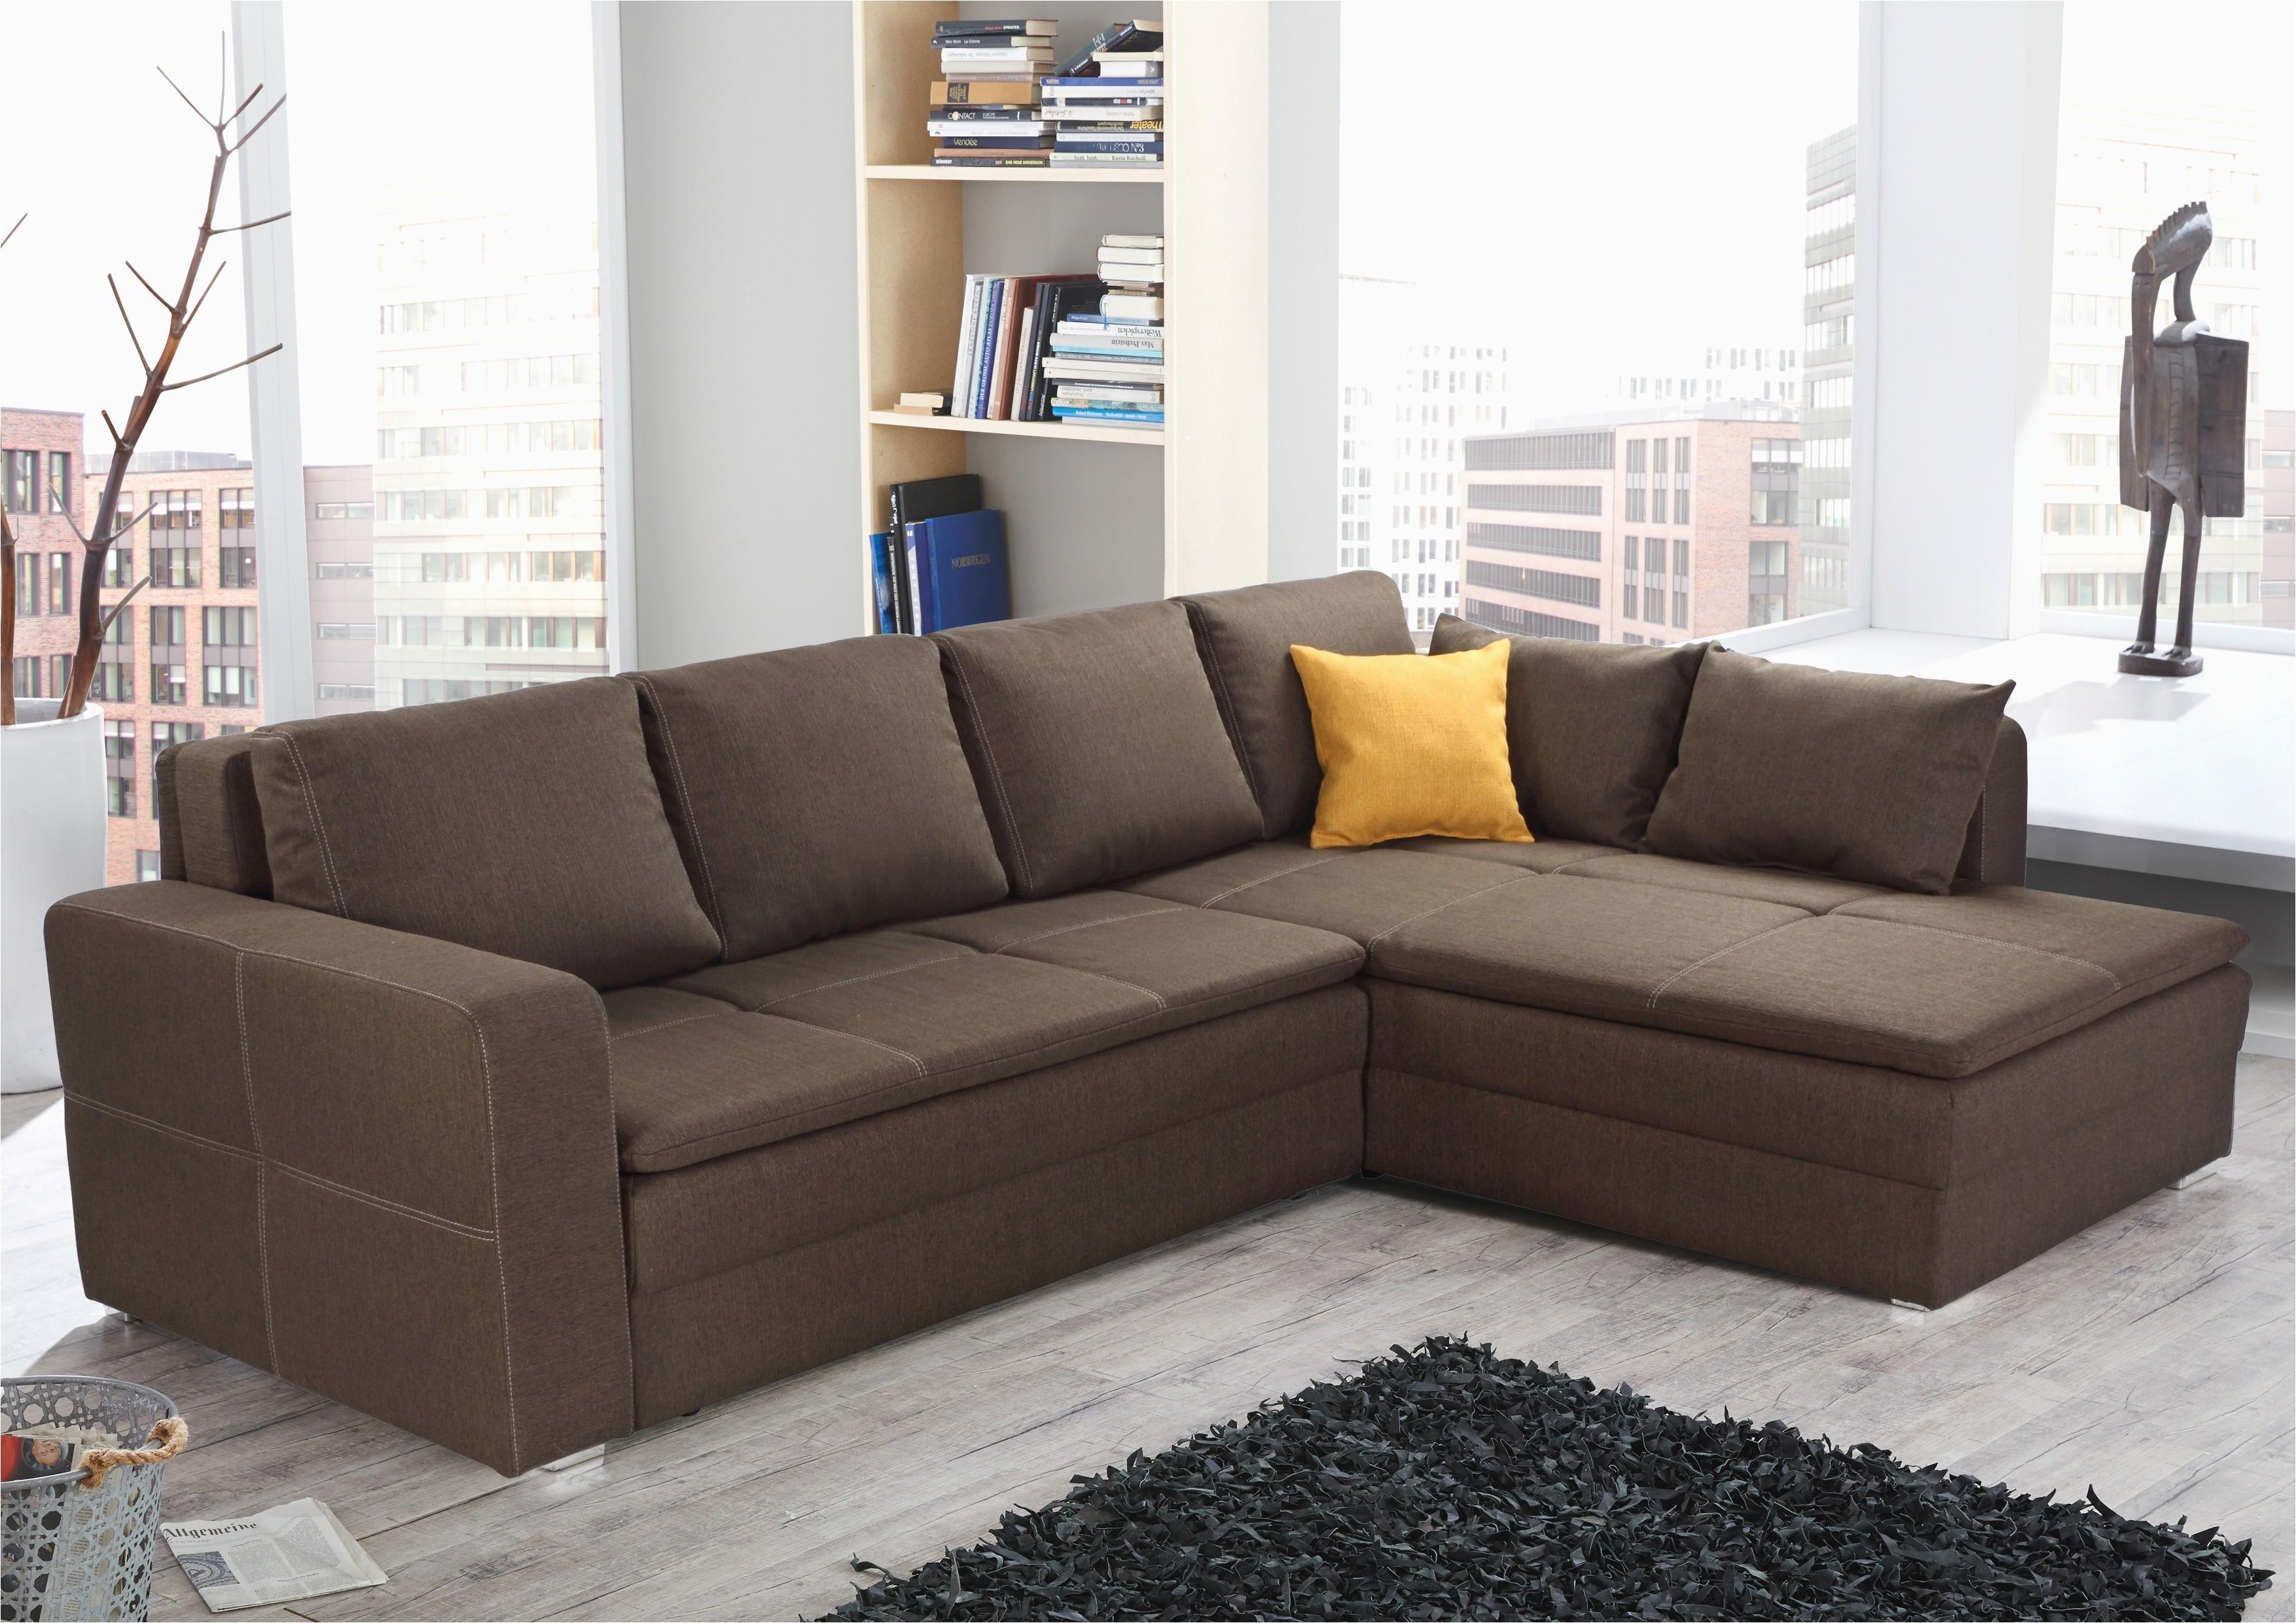 bed sofa set fresh 33 fresh macys furniture sleeper sofa gallery home furniture ideas